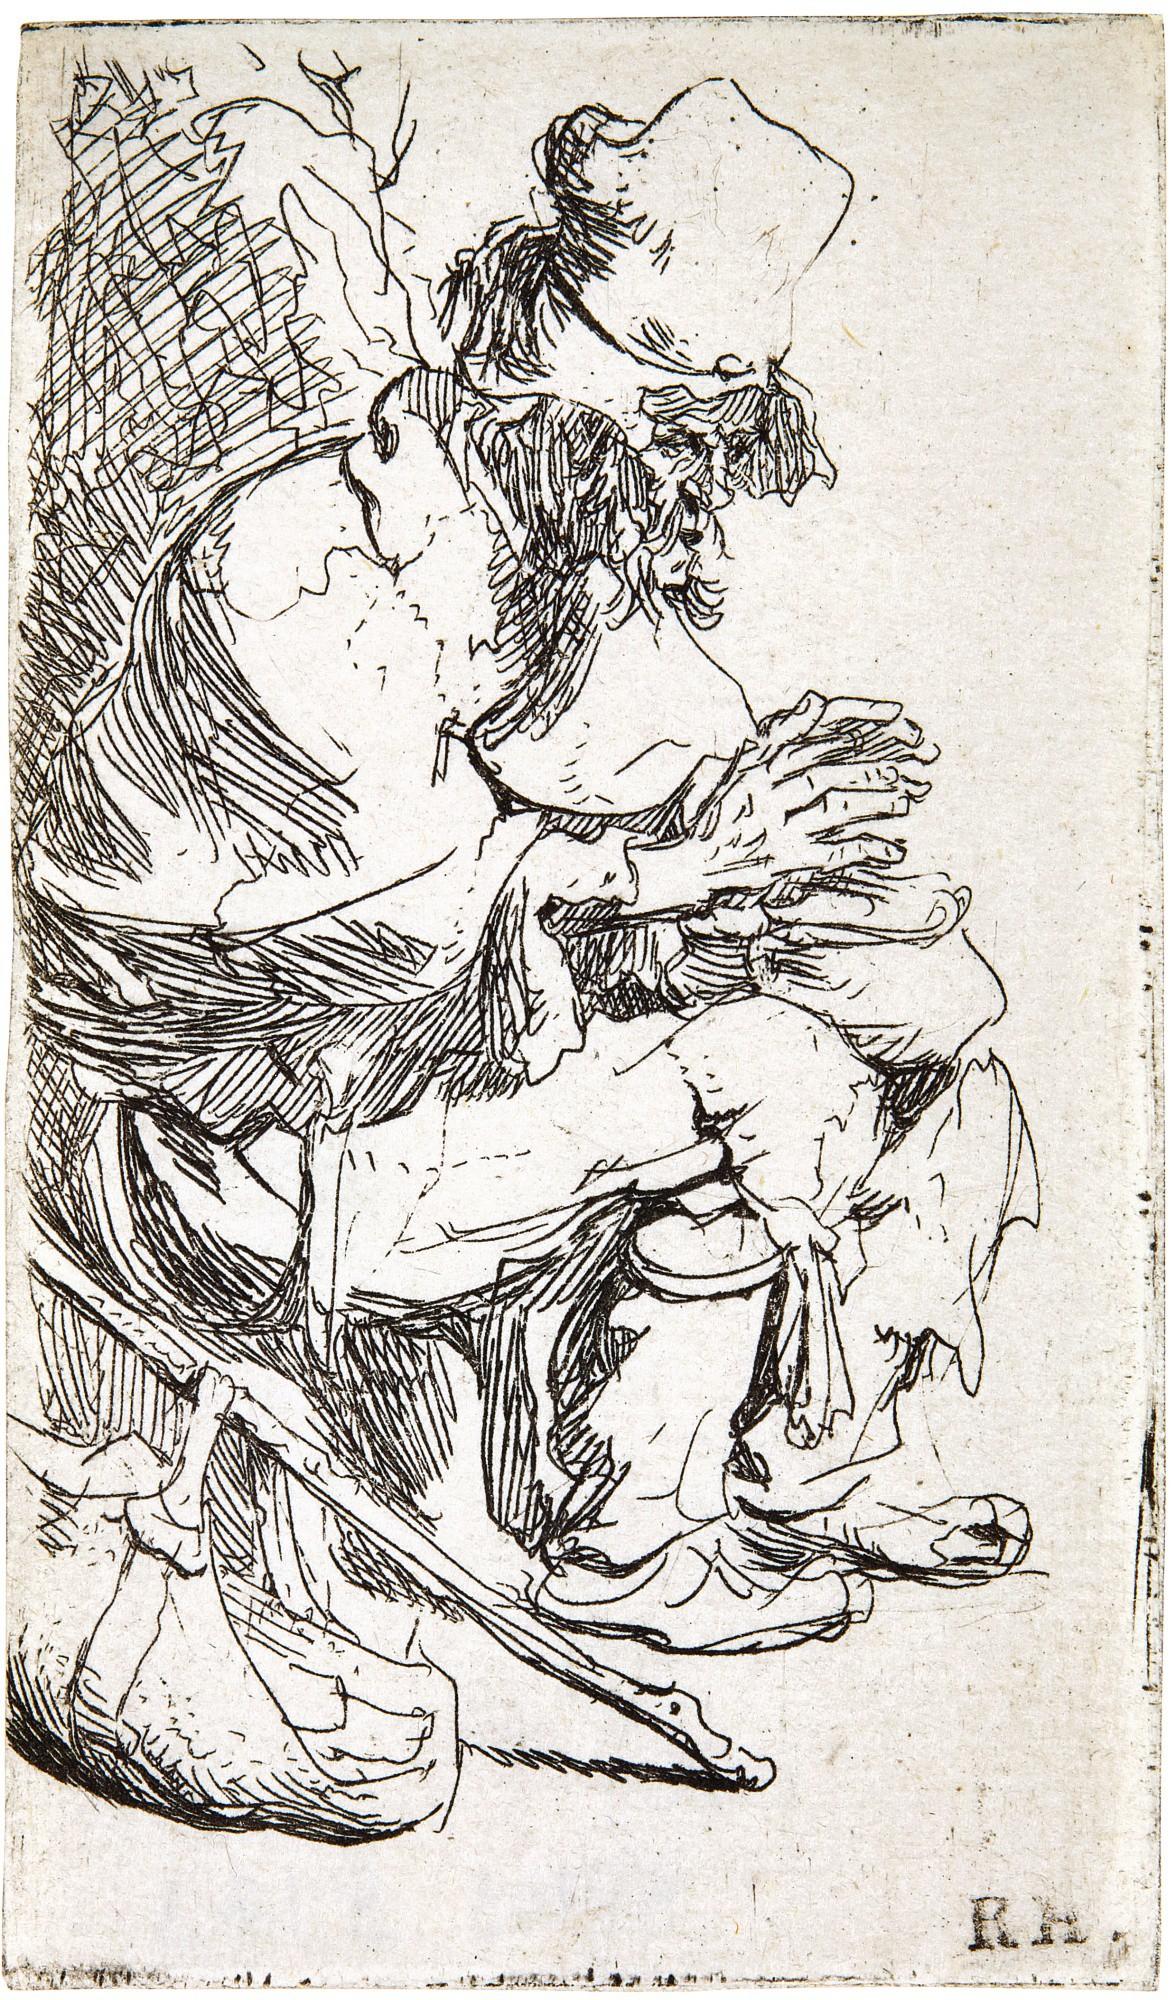 REMBRANDT HARMENSZ. VAN RIJN   BEGGAR SEATED WARMING HIS HANDS AT A CHAFING DISH (B., HOLL. 173; NEW HOLL. 44; H. 8)